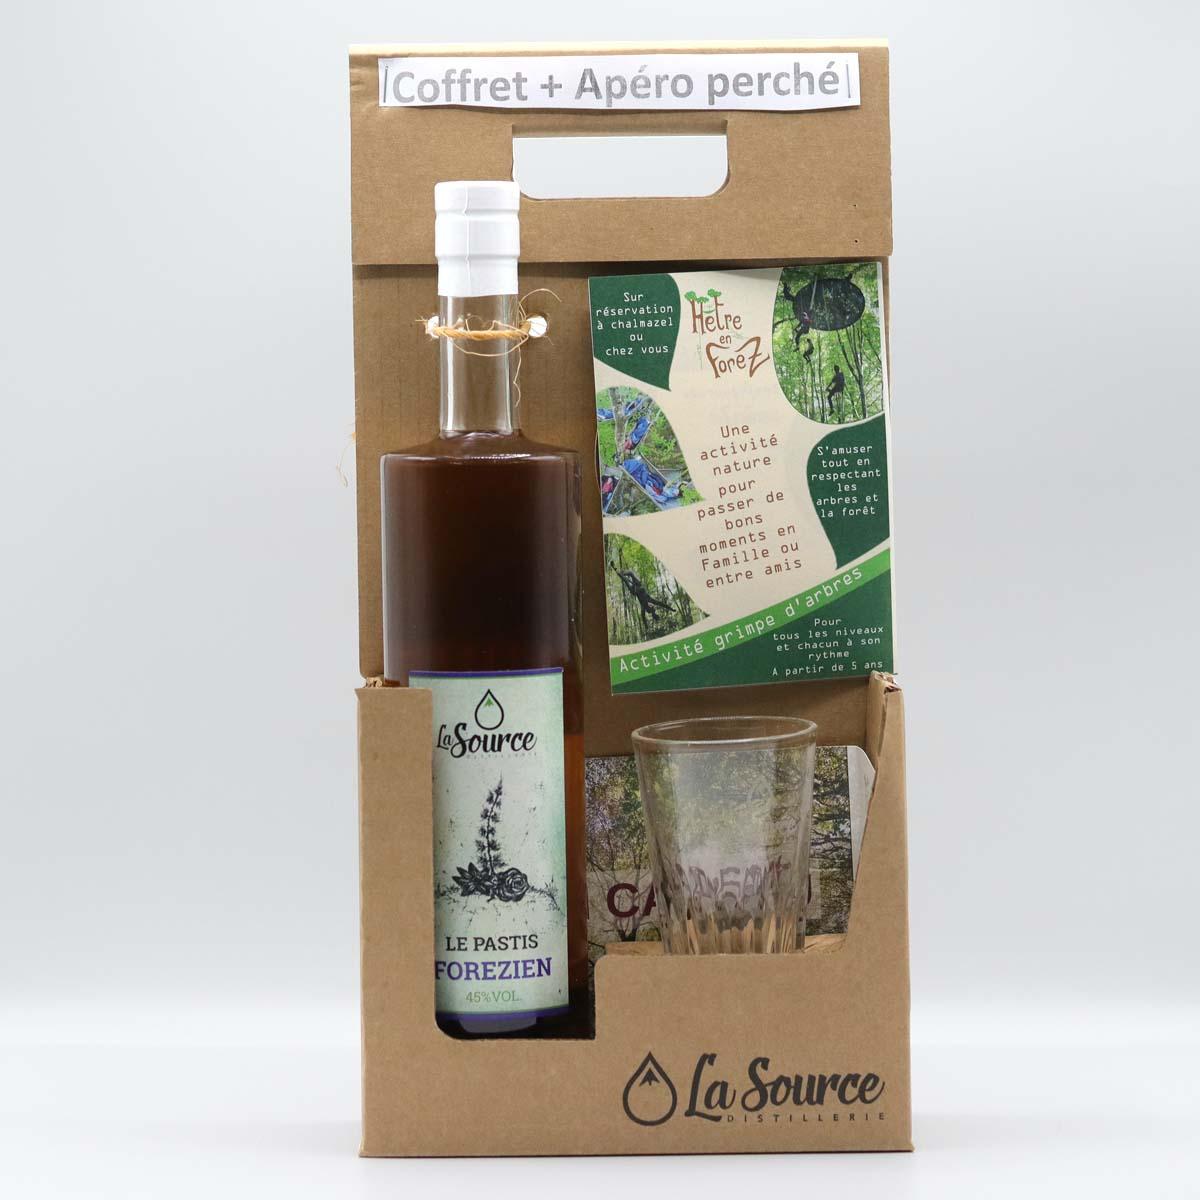 https://www.lasource-distillerie.fr/wp-content/uploads/2021/10/coffret-apero-pastis.jpg